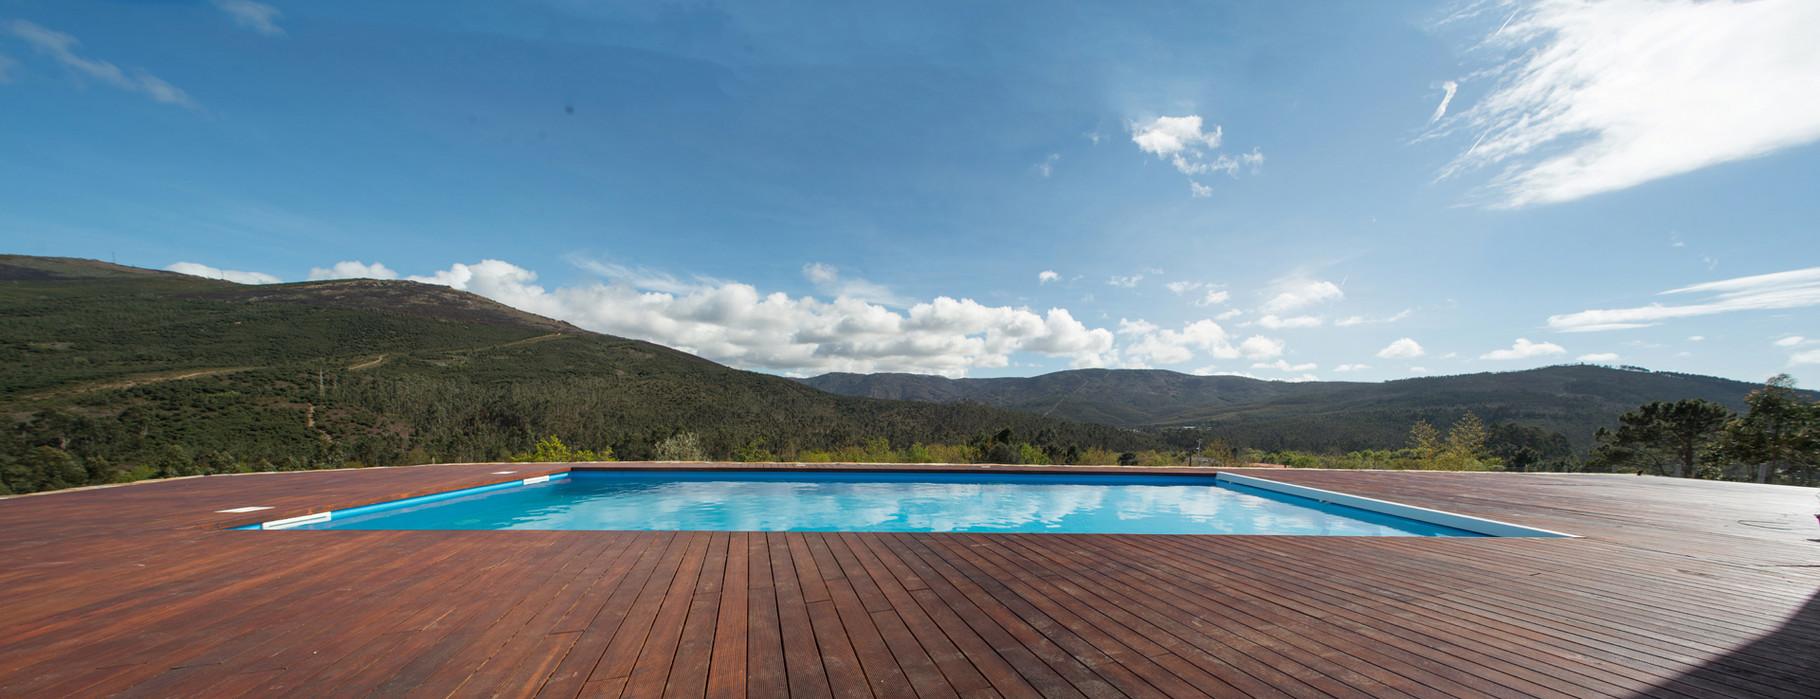 Vista da piscina